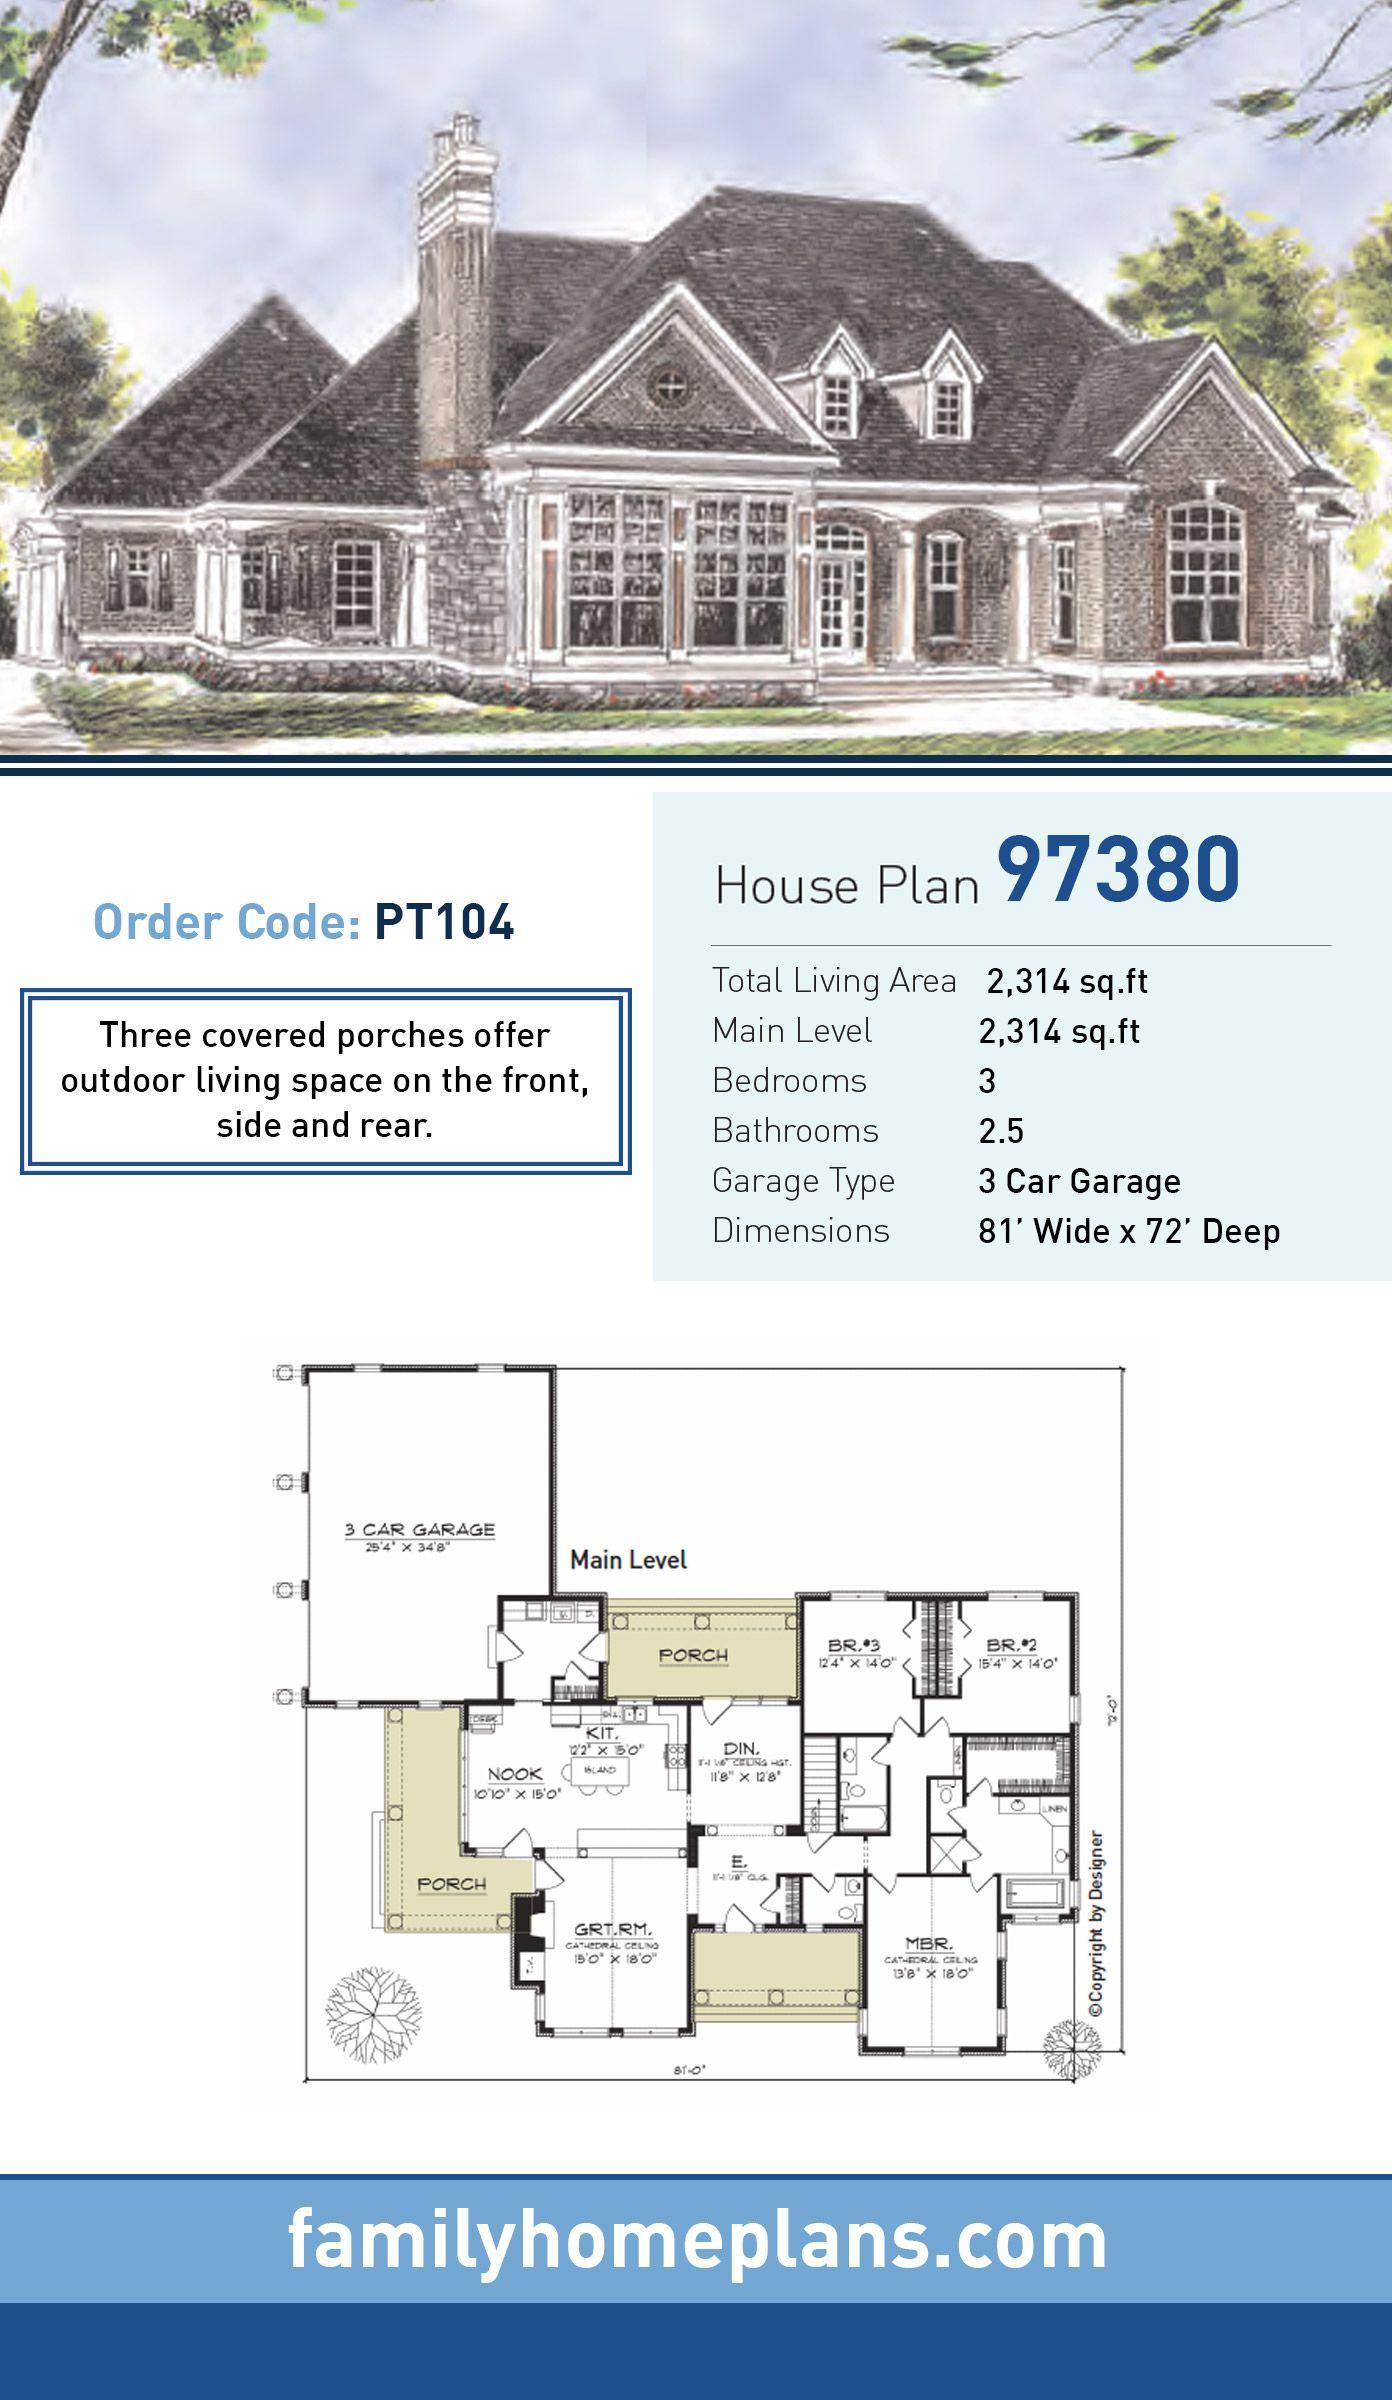 European house plan 97380 total living area 2 314 sq ft for Europeanhome com